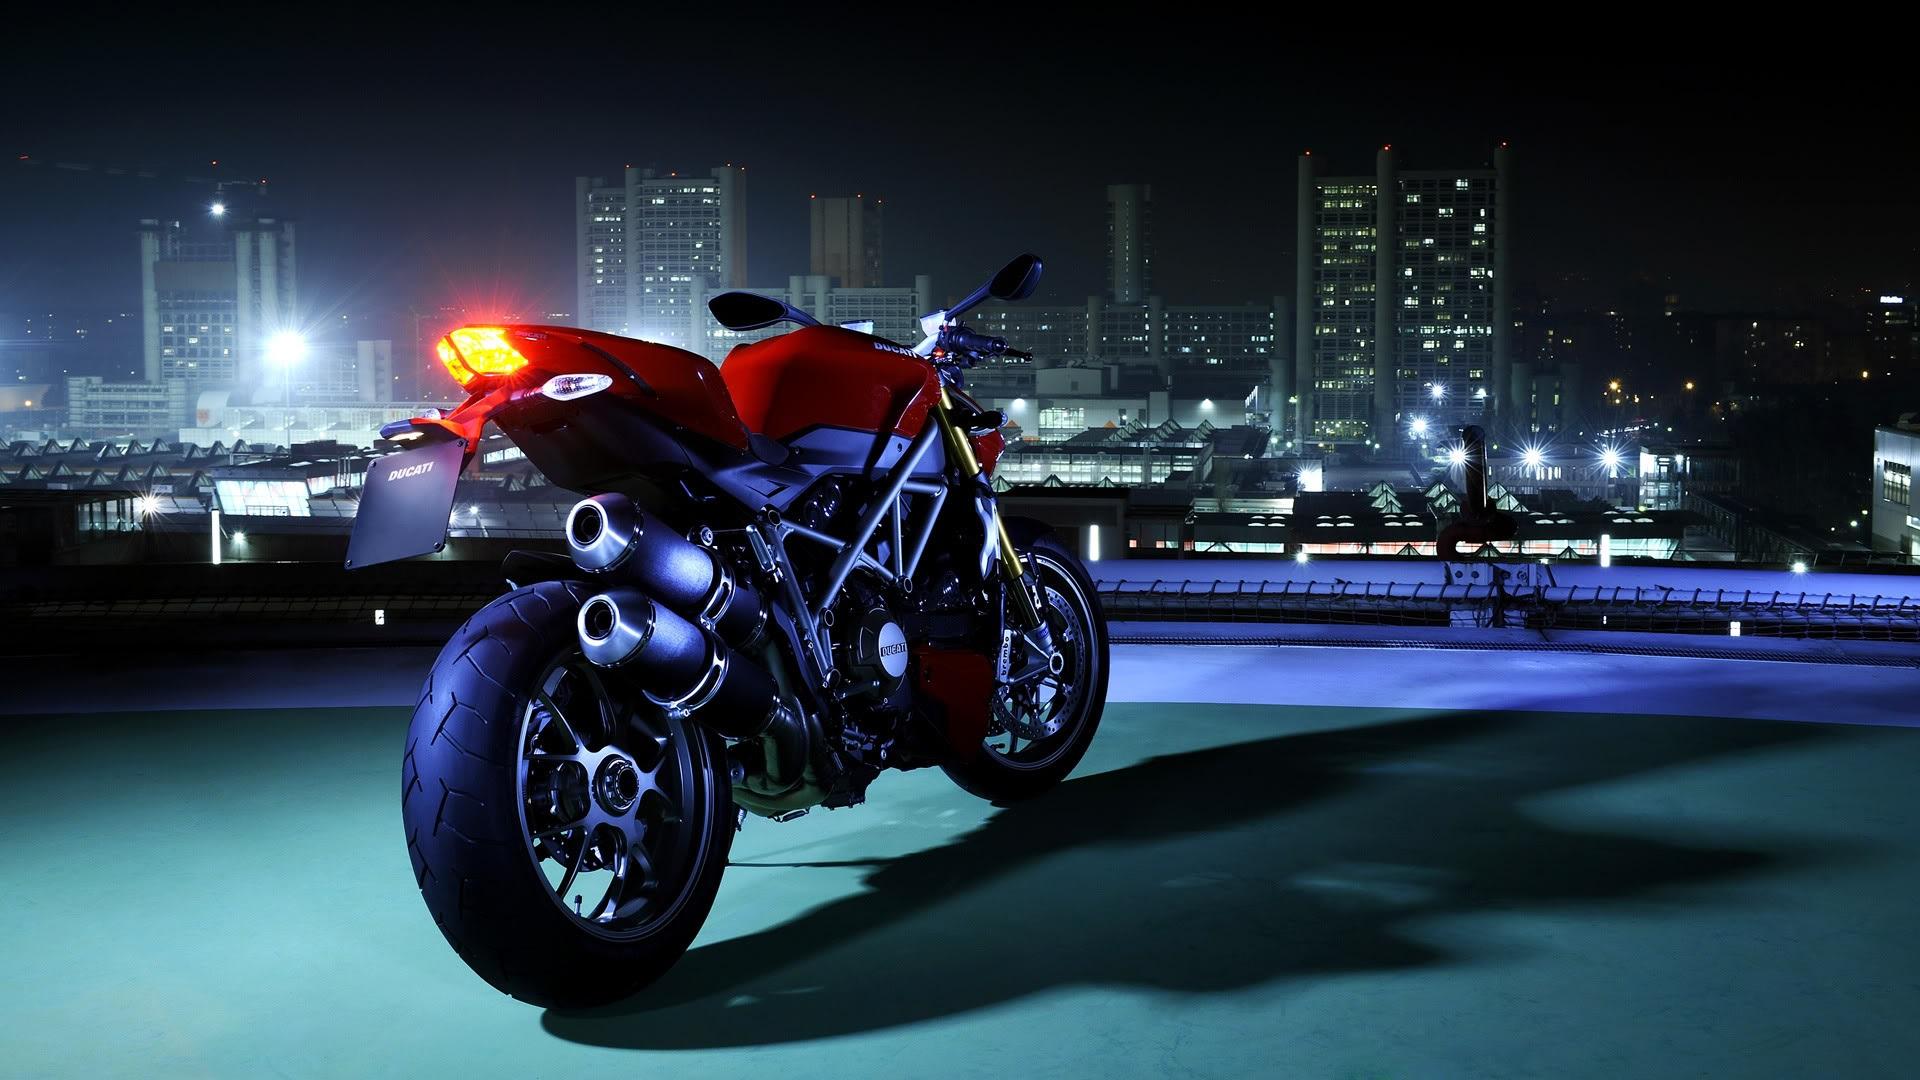 квартиру подай картинки мотоцикл и ночь системы икеа